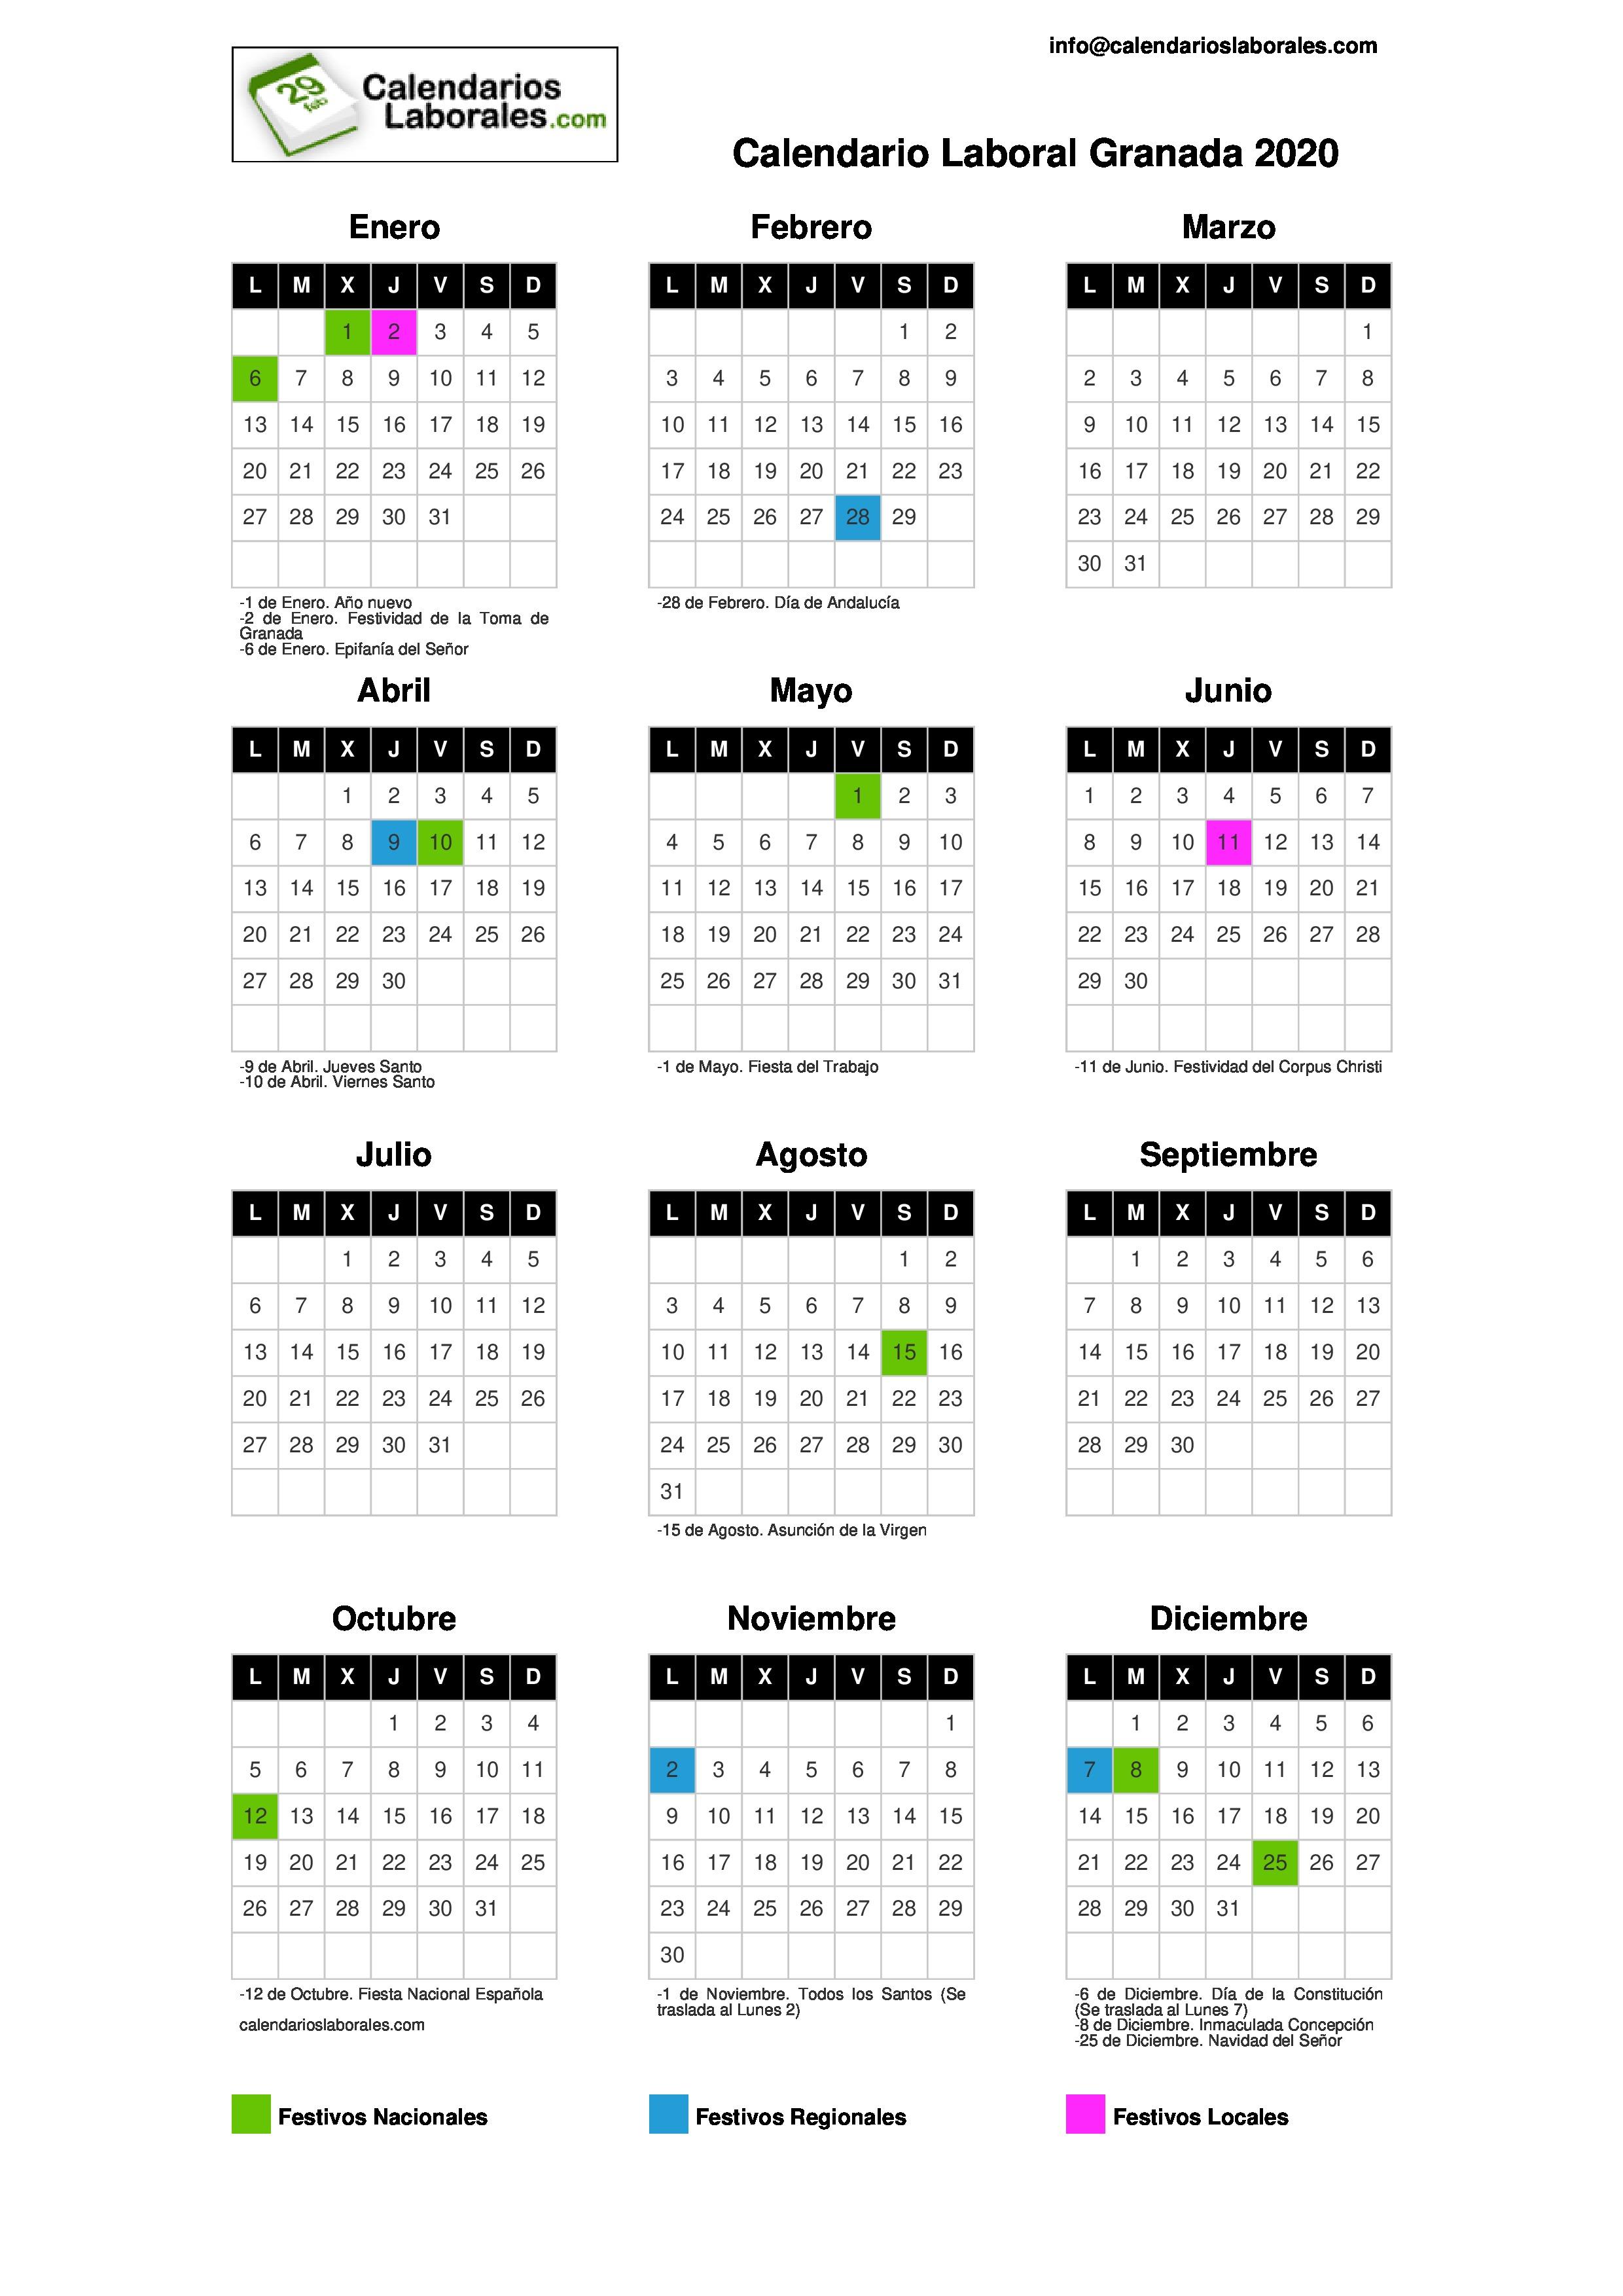 Calendario Liga Bbva 2020.Calendario Laboral Granada 2020